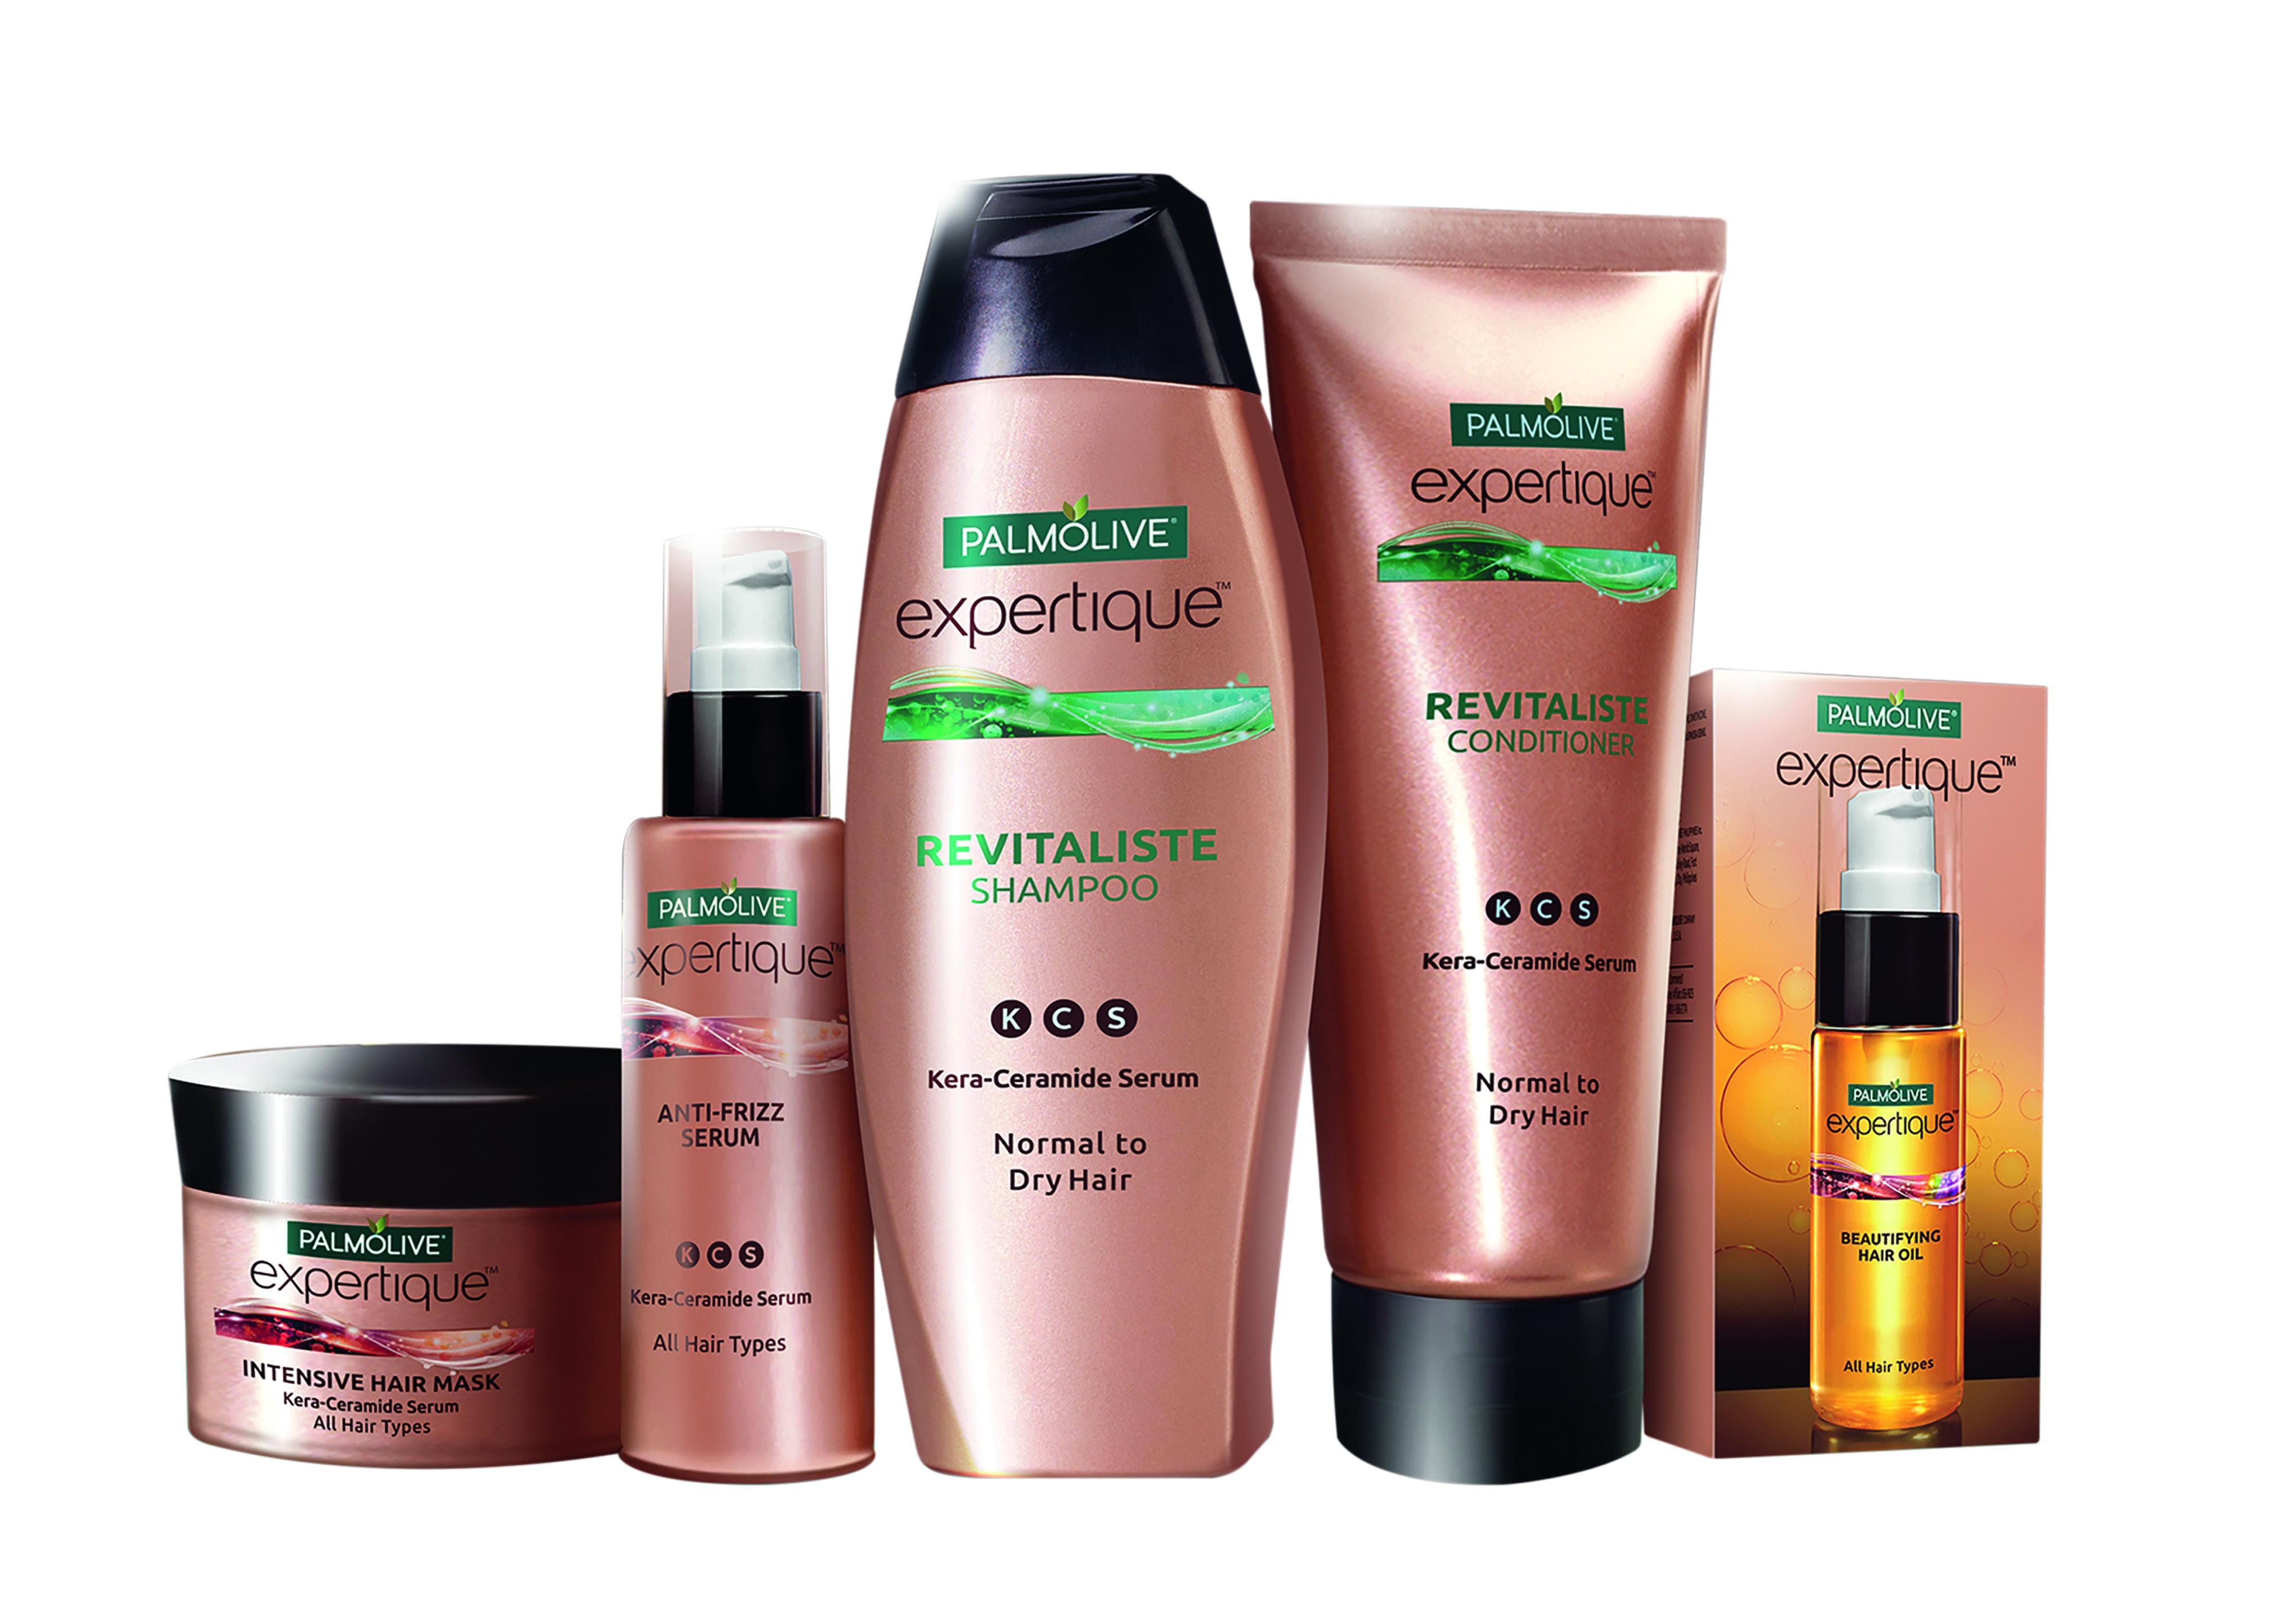 Palmolive Expertique Complete Line